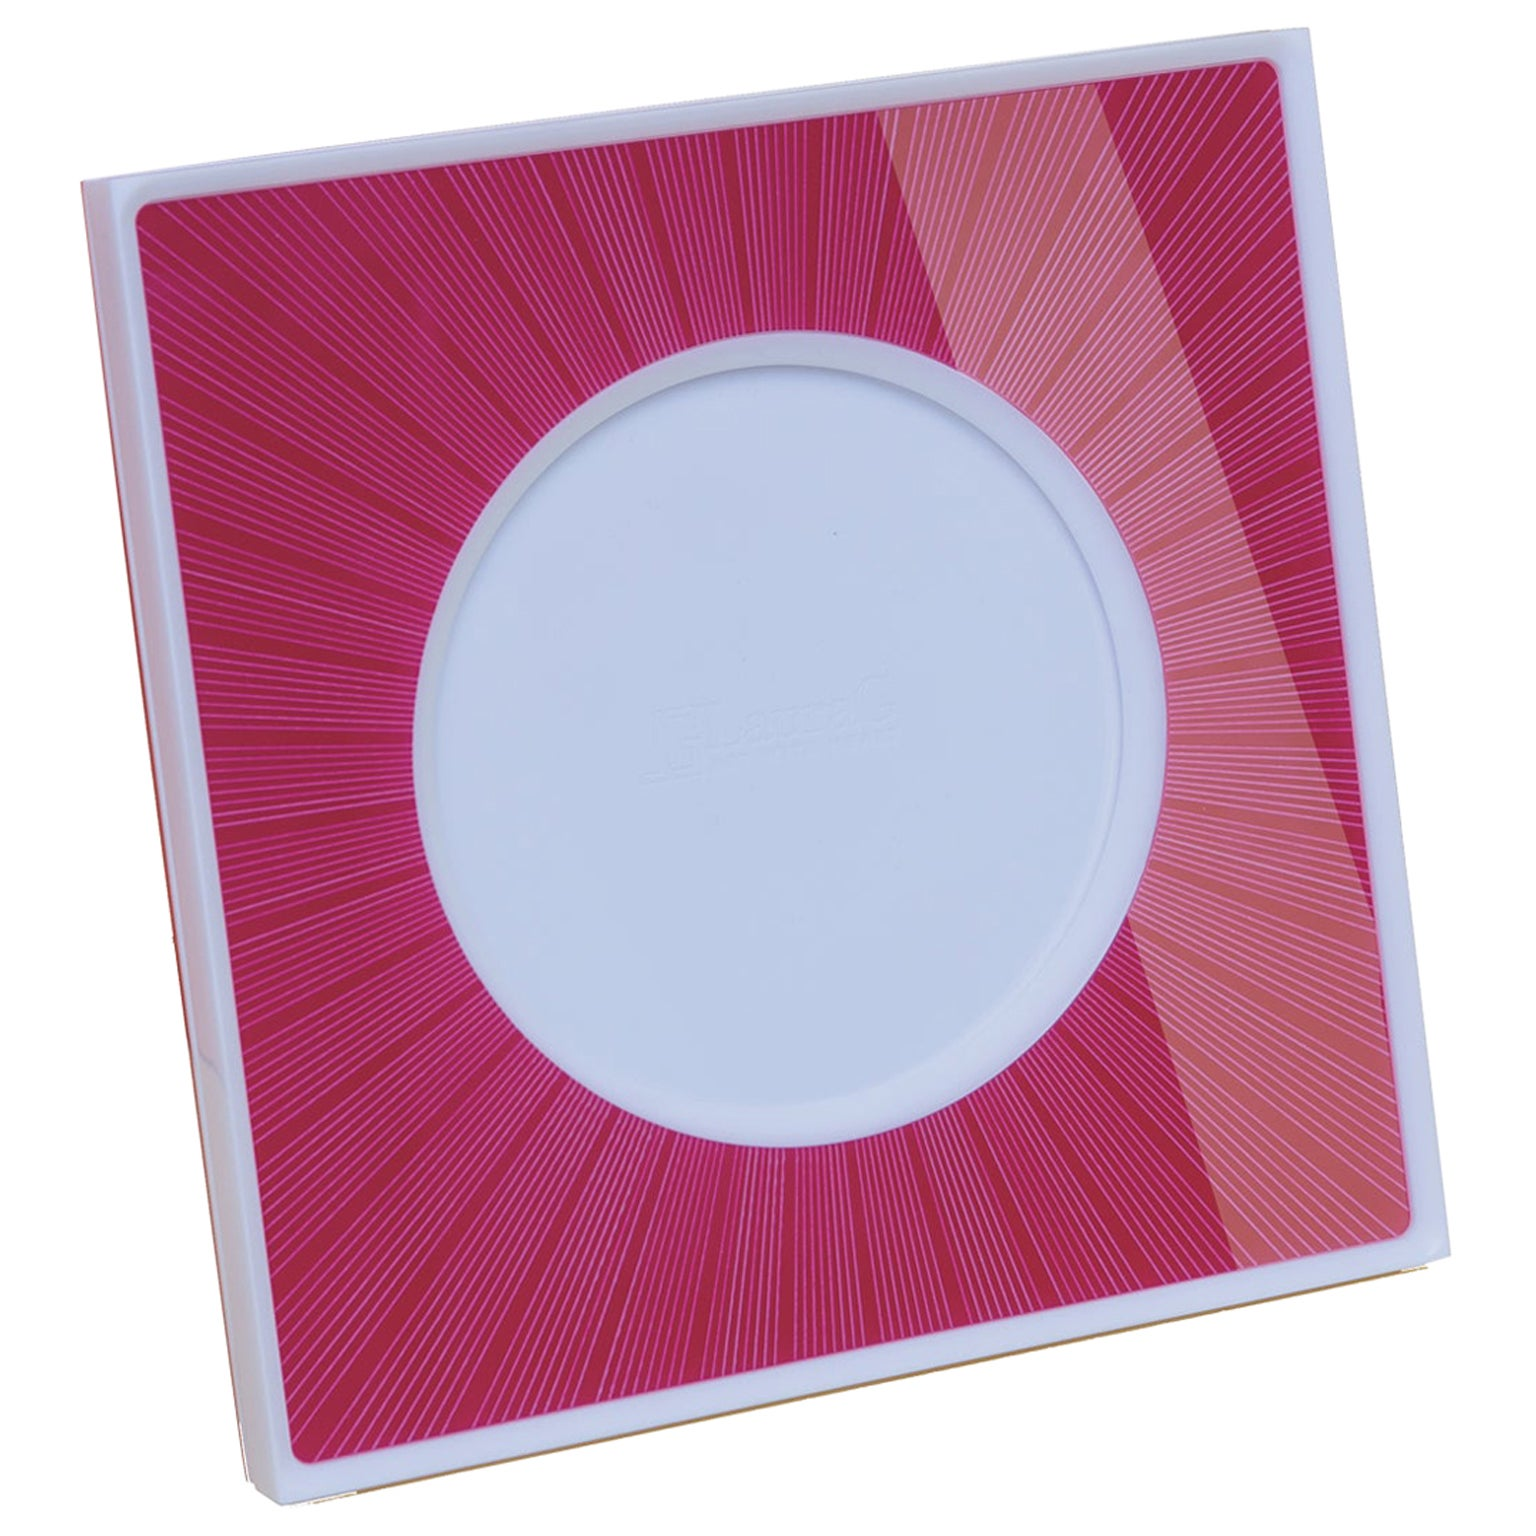 Italian Pop Design Shocking and White Plexiglass Picture Frame, Sharing Shocking